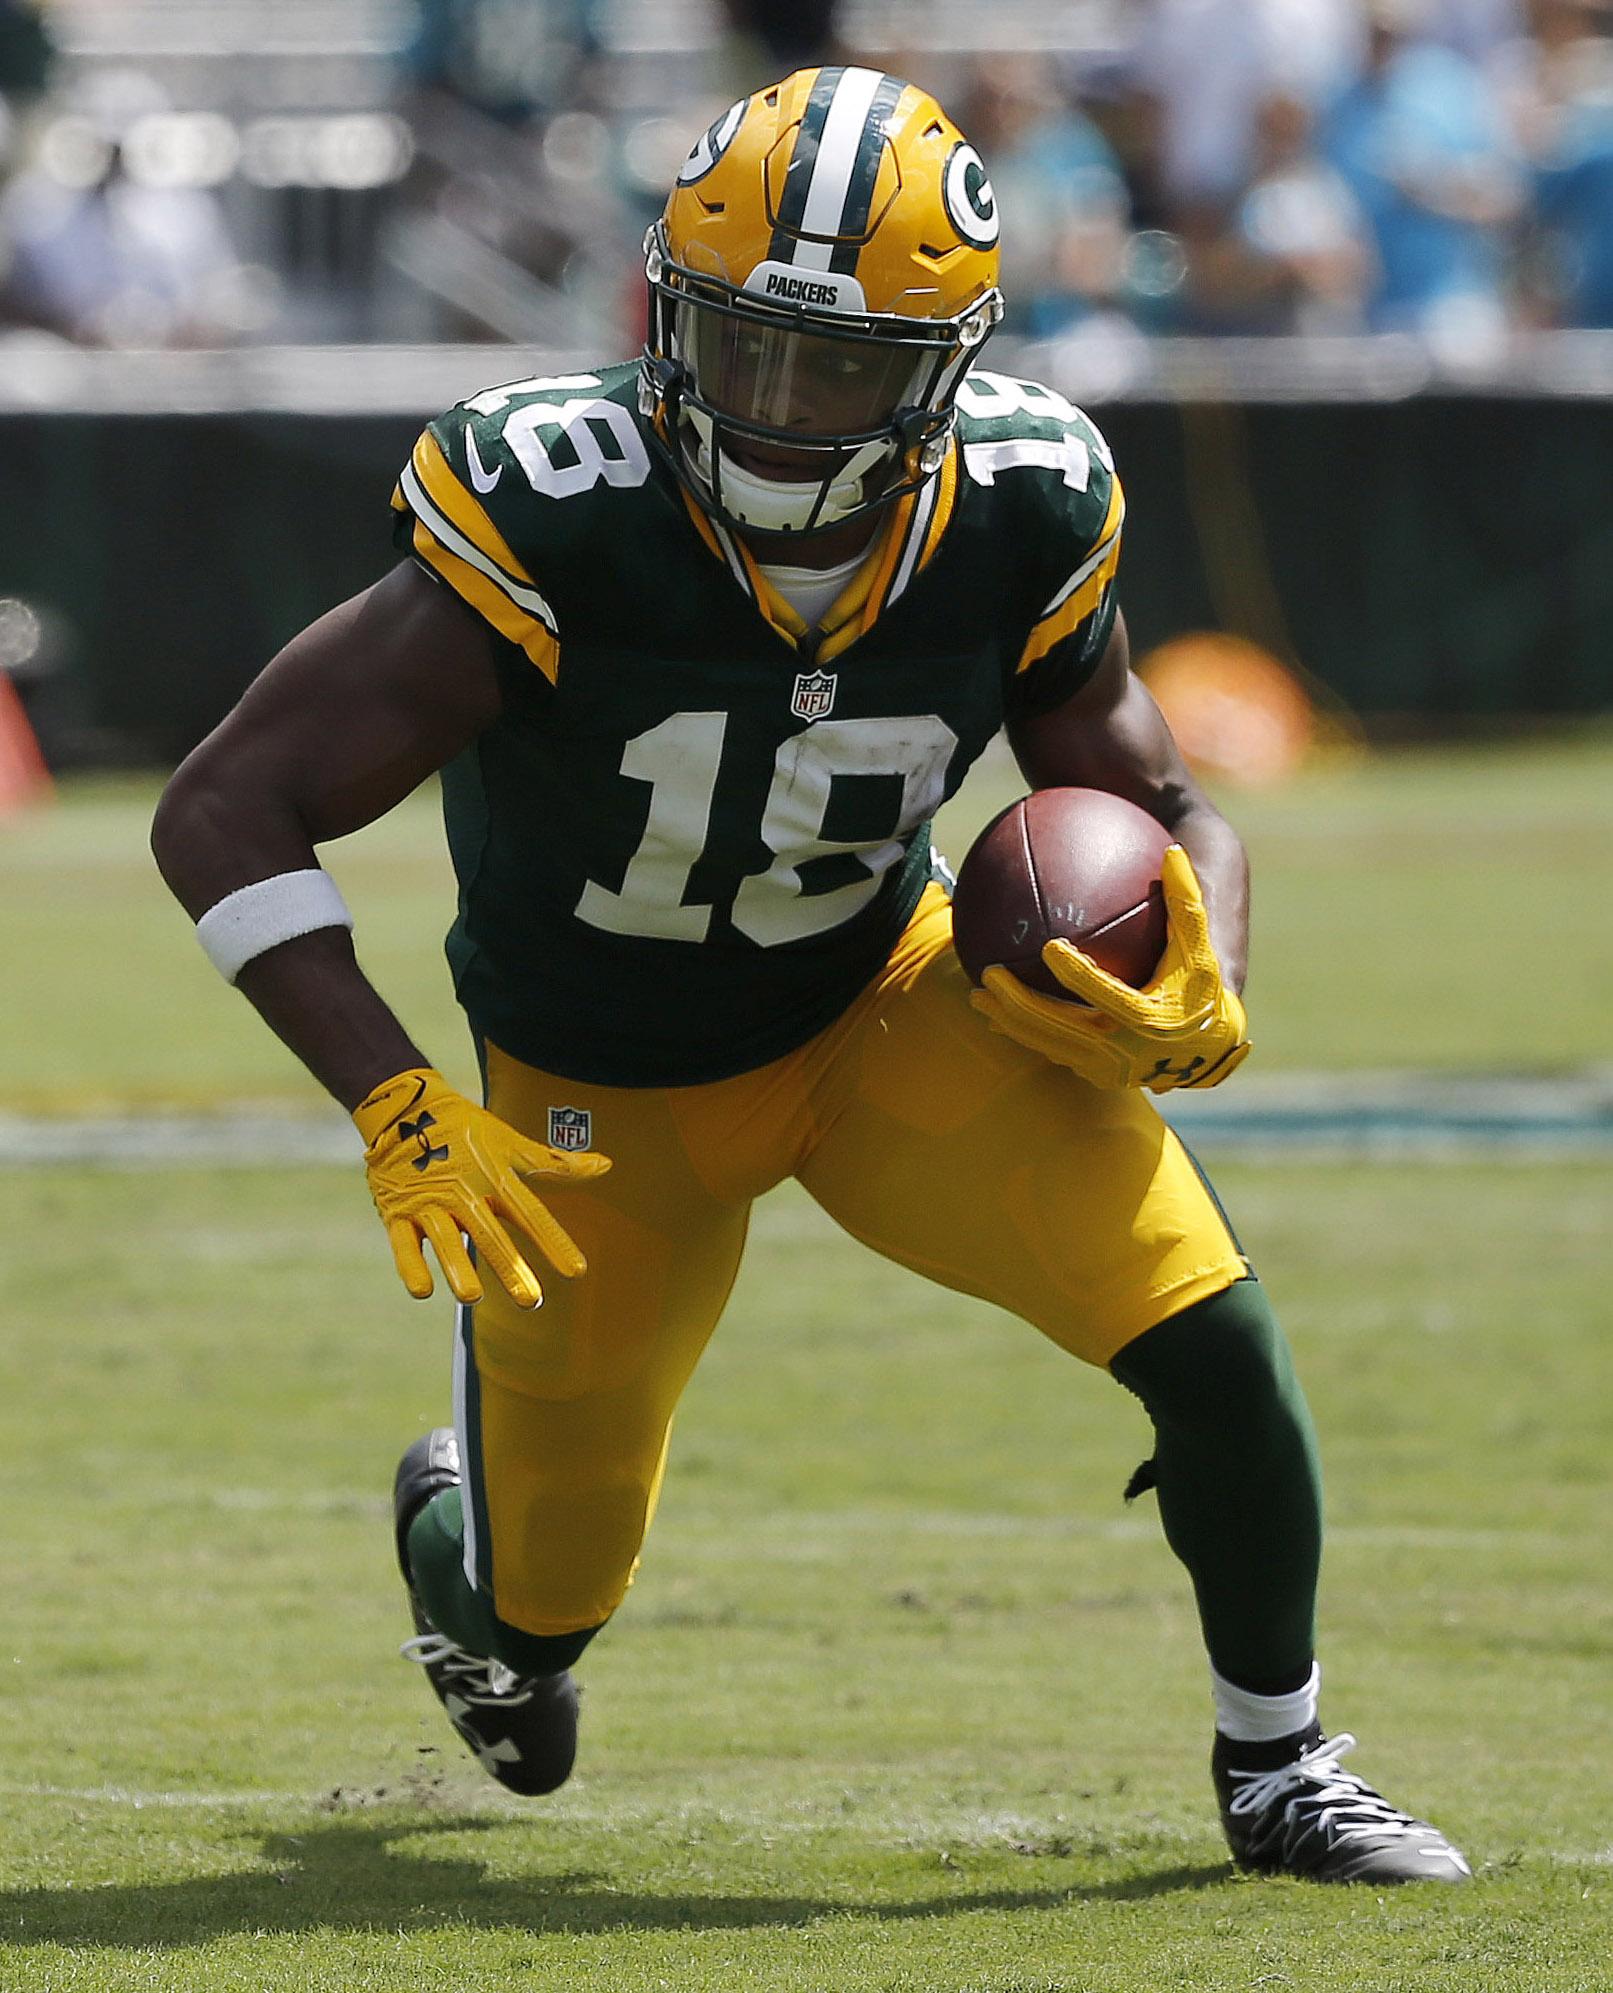 NFL: Green Bay Packers at Jacksonville Jaguars